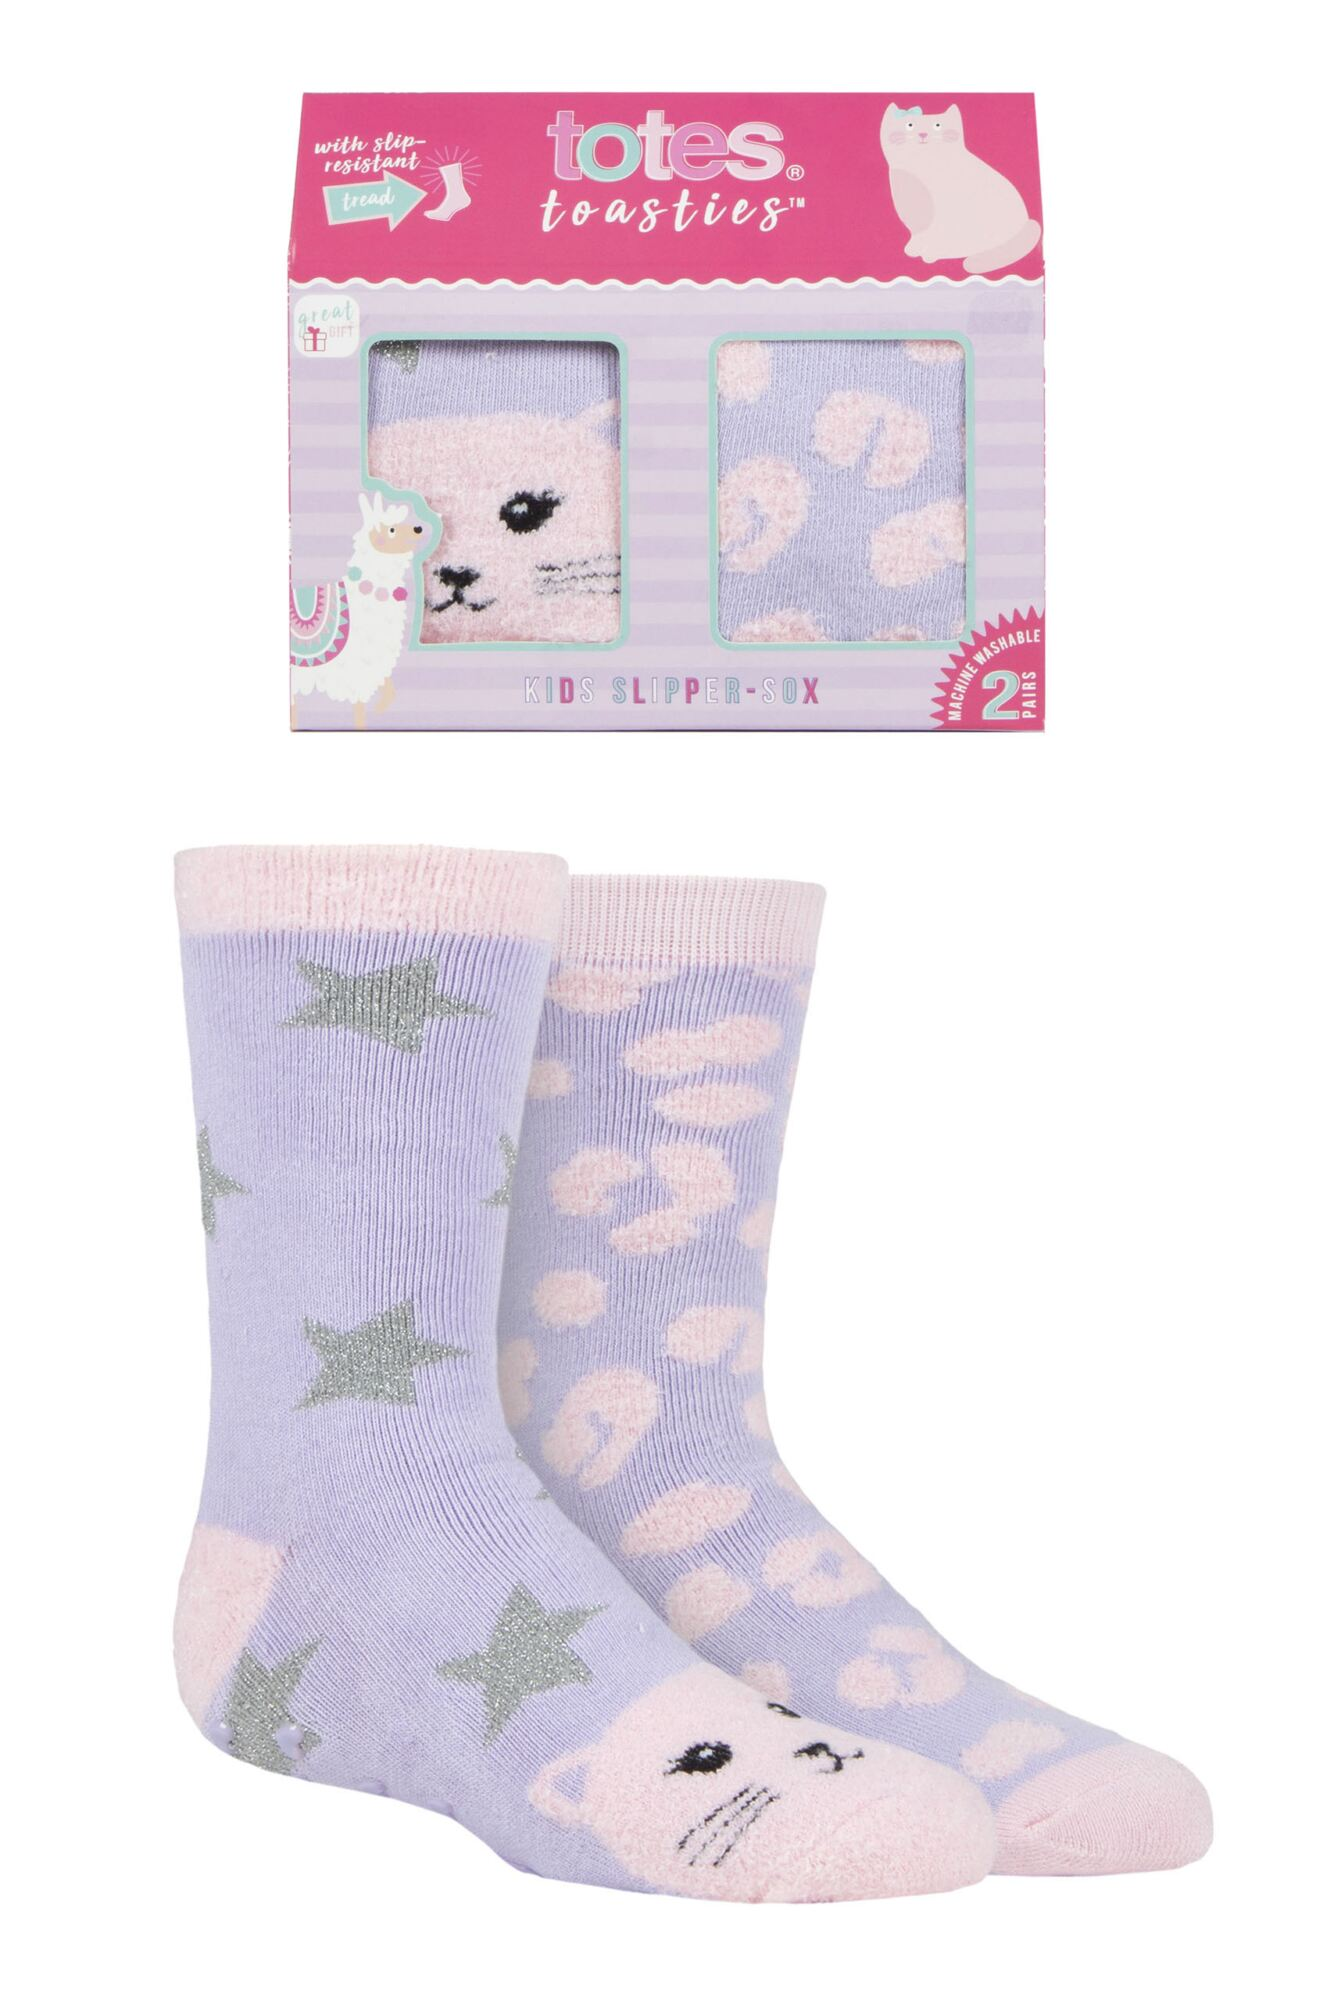 2 Pair Originals Novelty Slipper Socks Girls - Totes